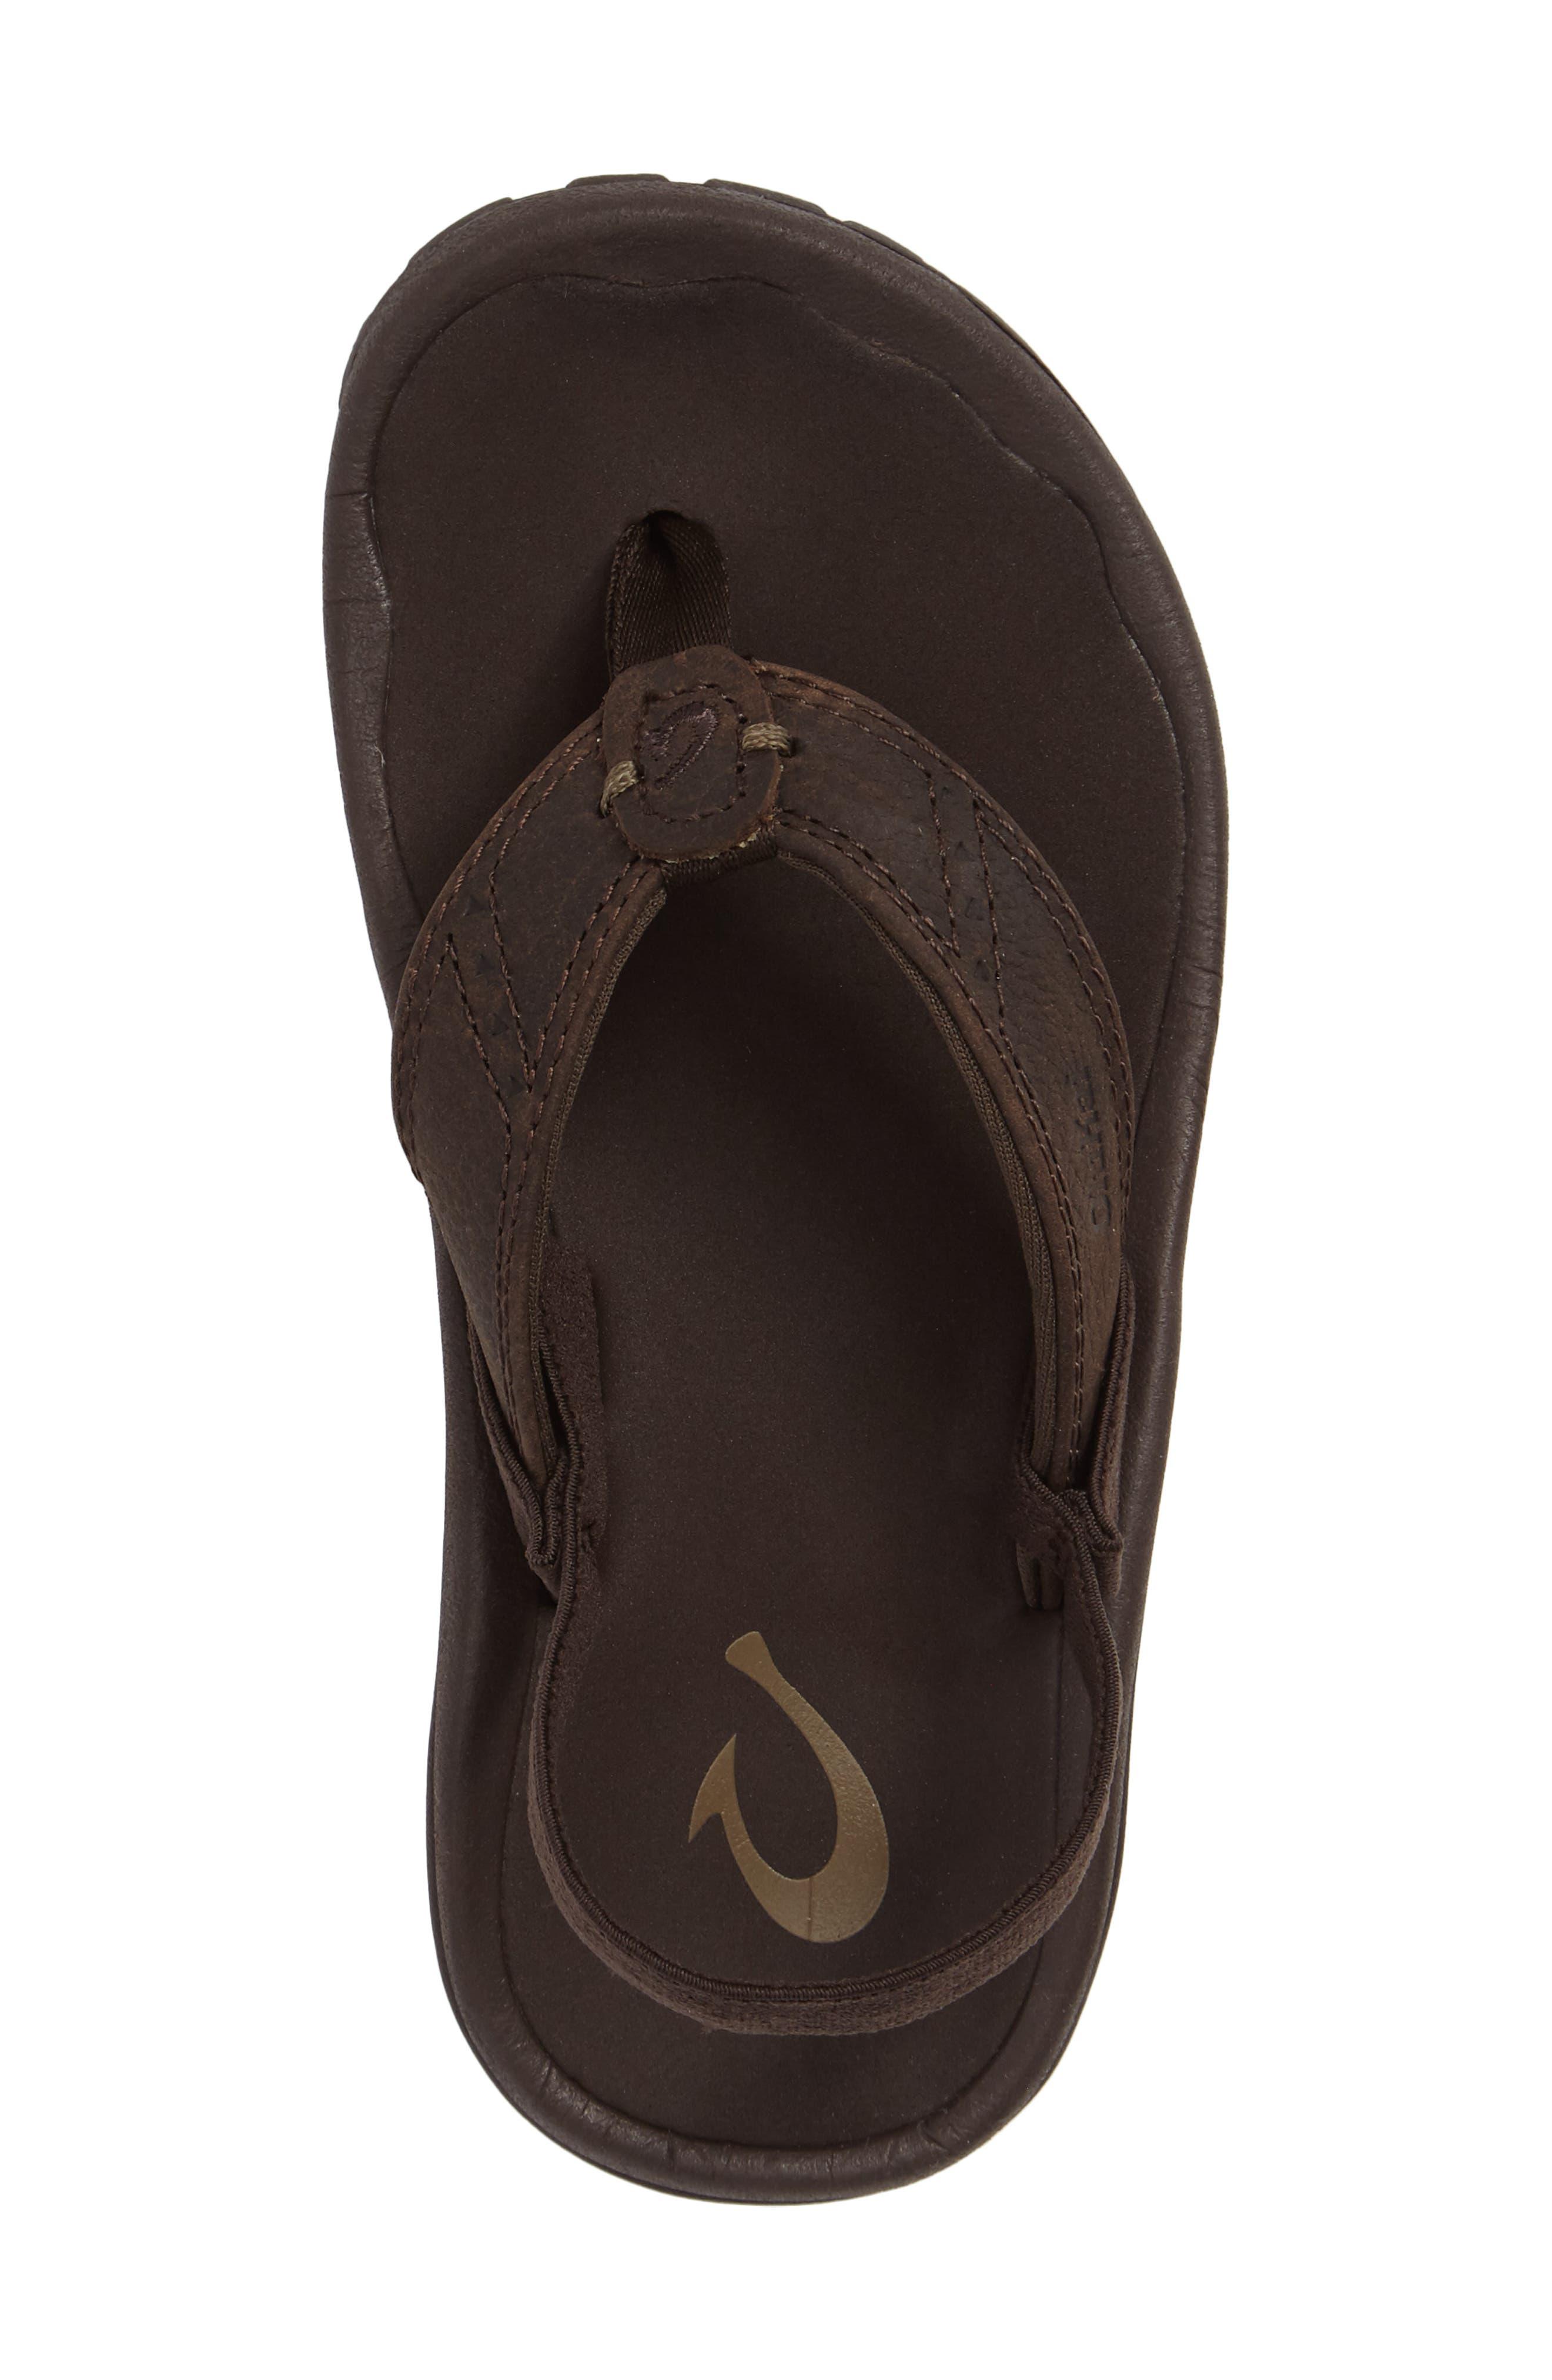 OLUKAI,                             Nui Leather Sandal,                             Alternate thumbnail 5, color,                             SEAL BROWN/ DARK JAVA